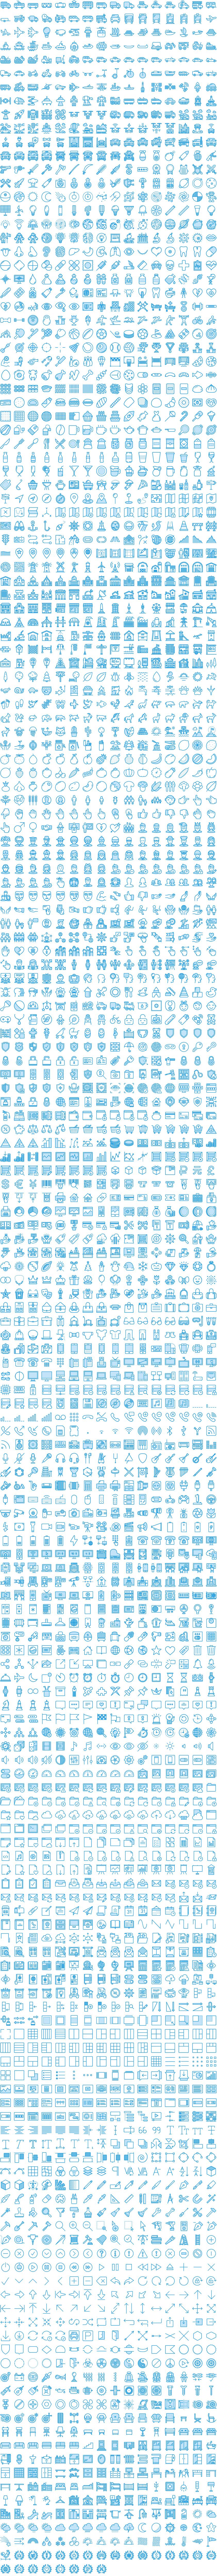 Unigrid Bluetone icons full